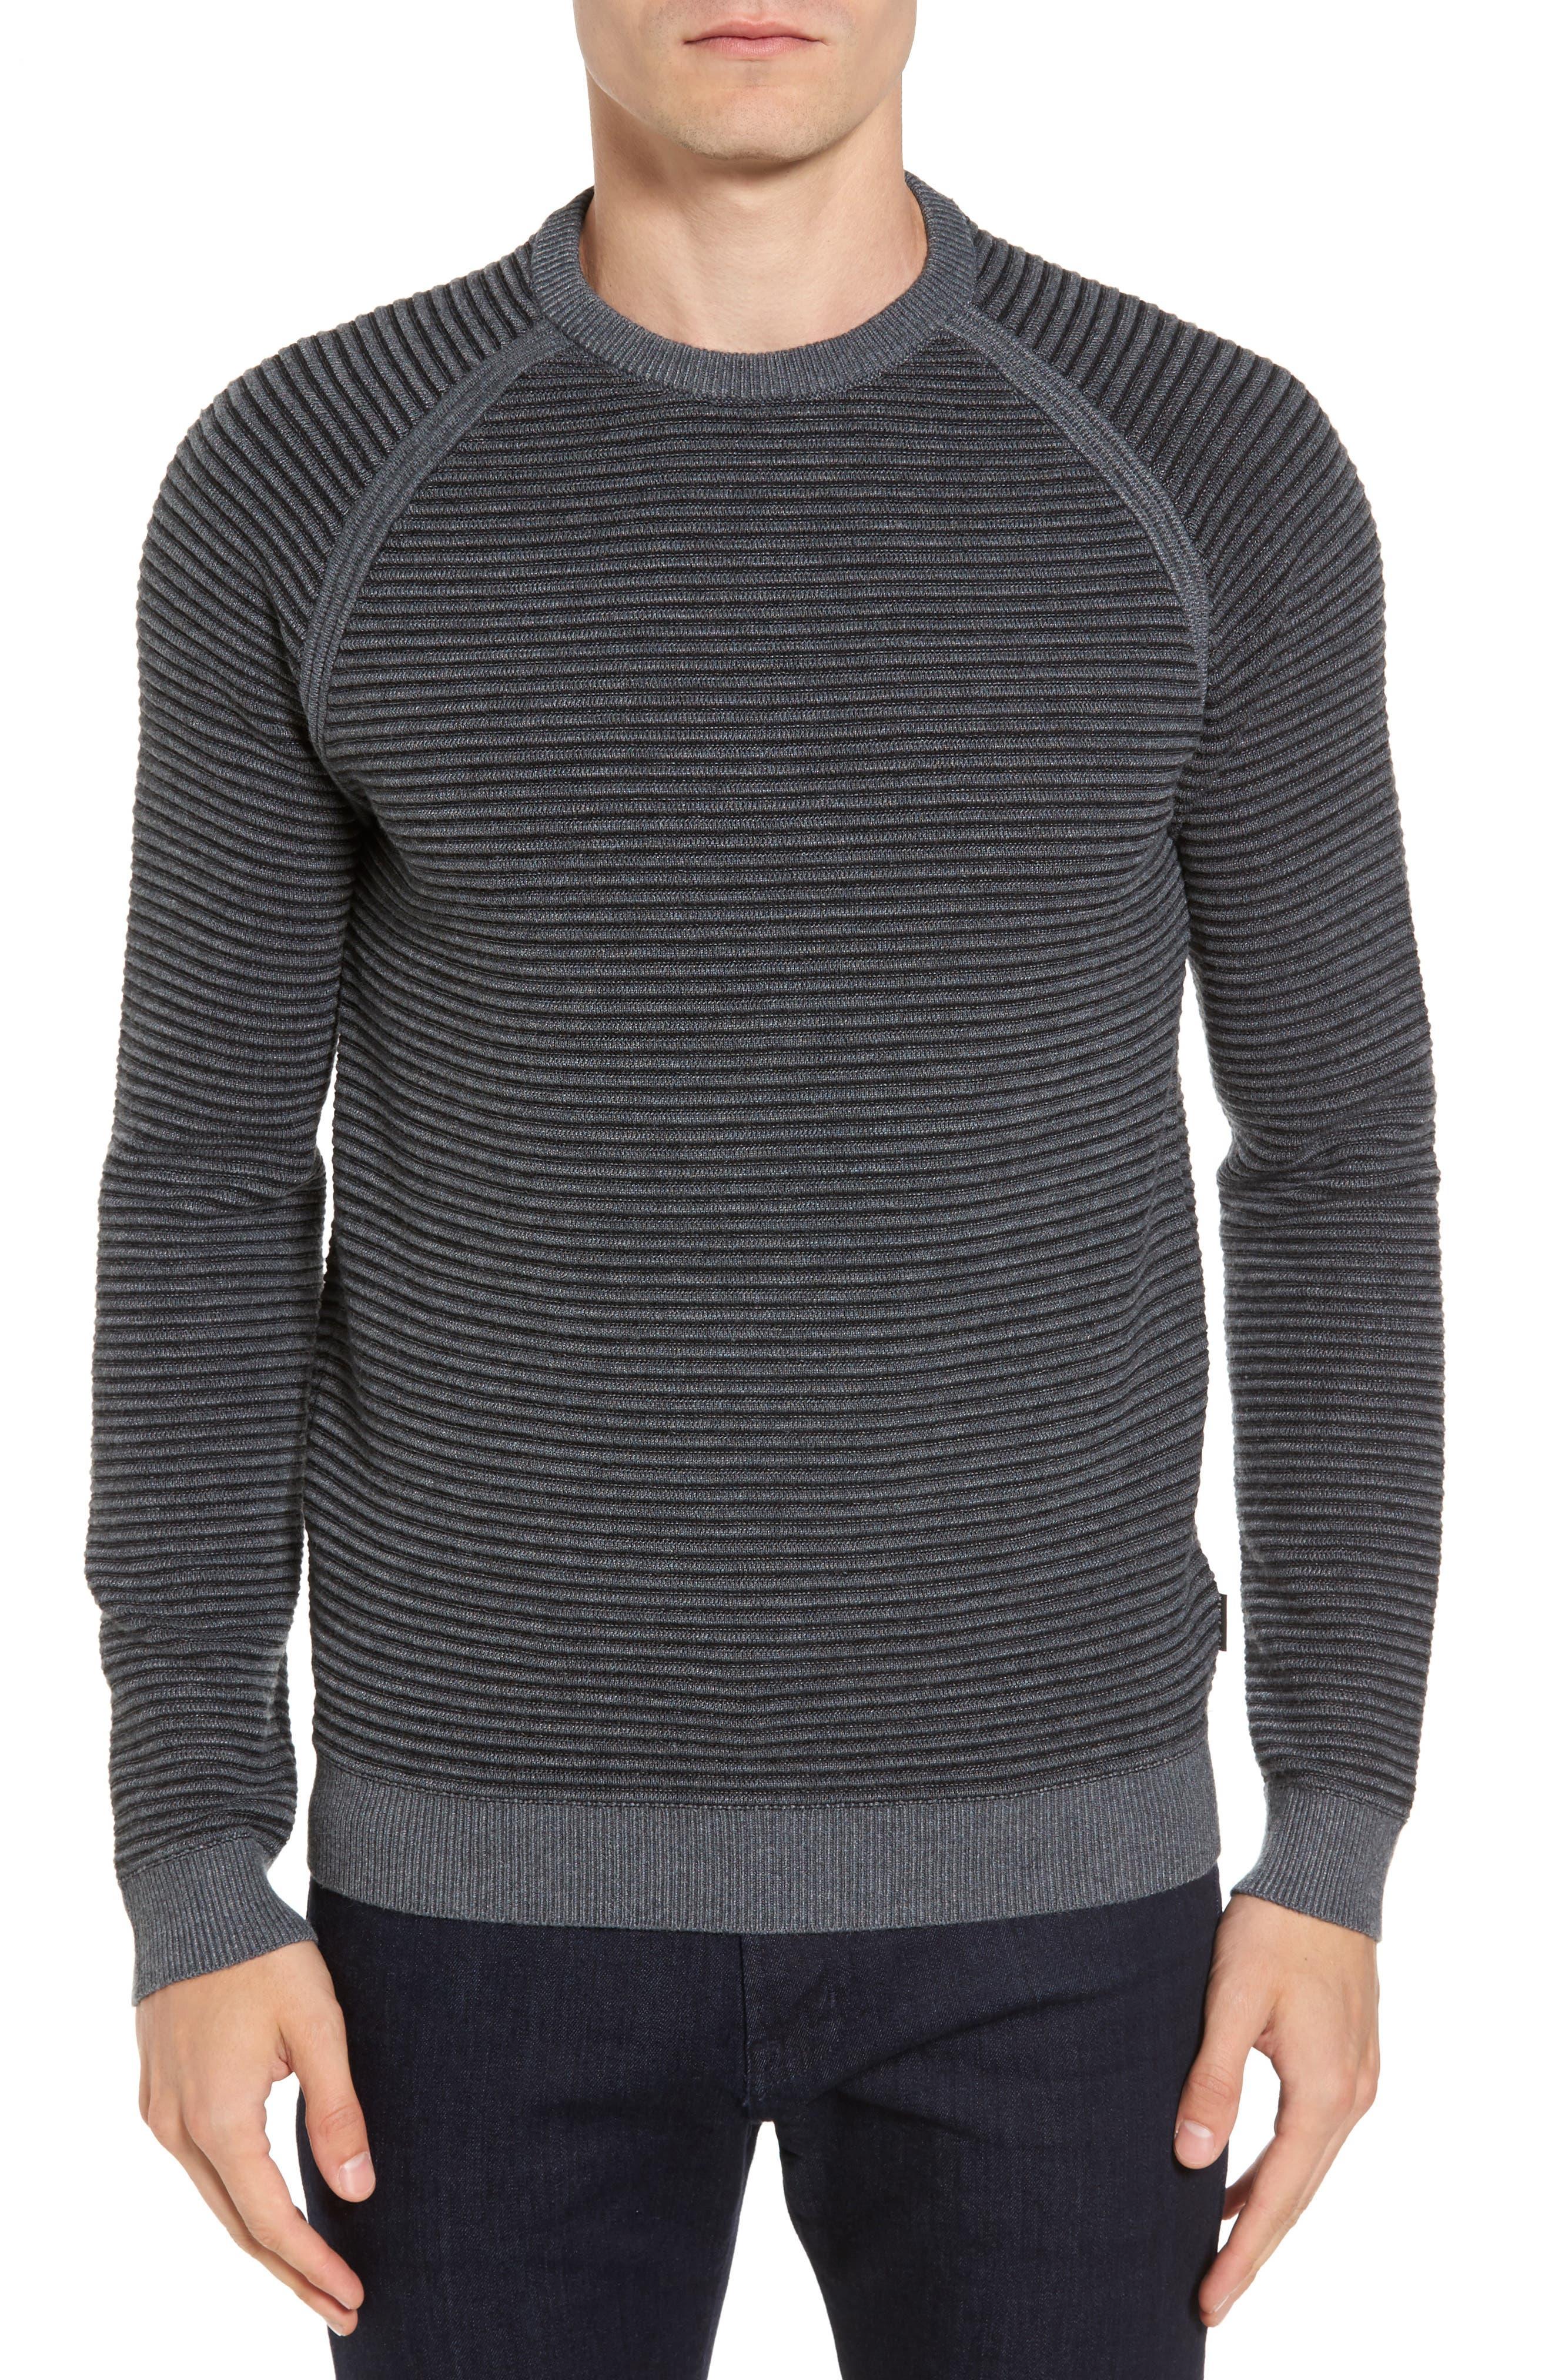 Cashoo Slim Fit Ribbed Sweatshirt,                             Main thumbnail 1, color,                             030